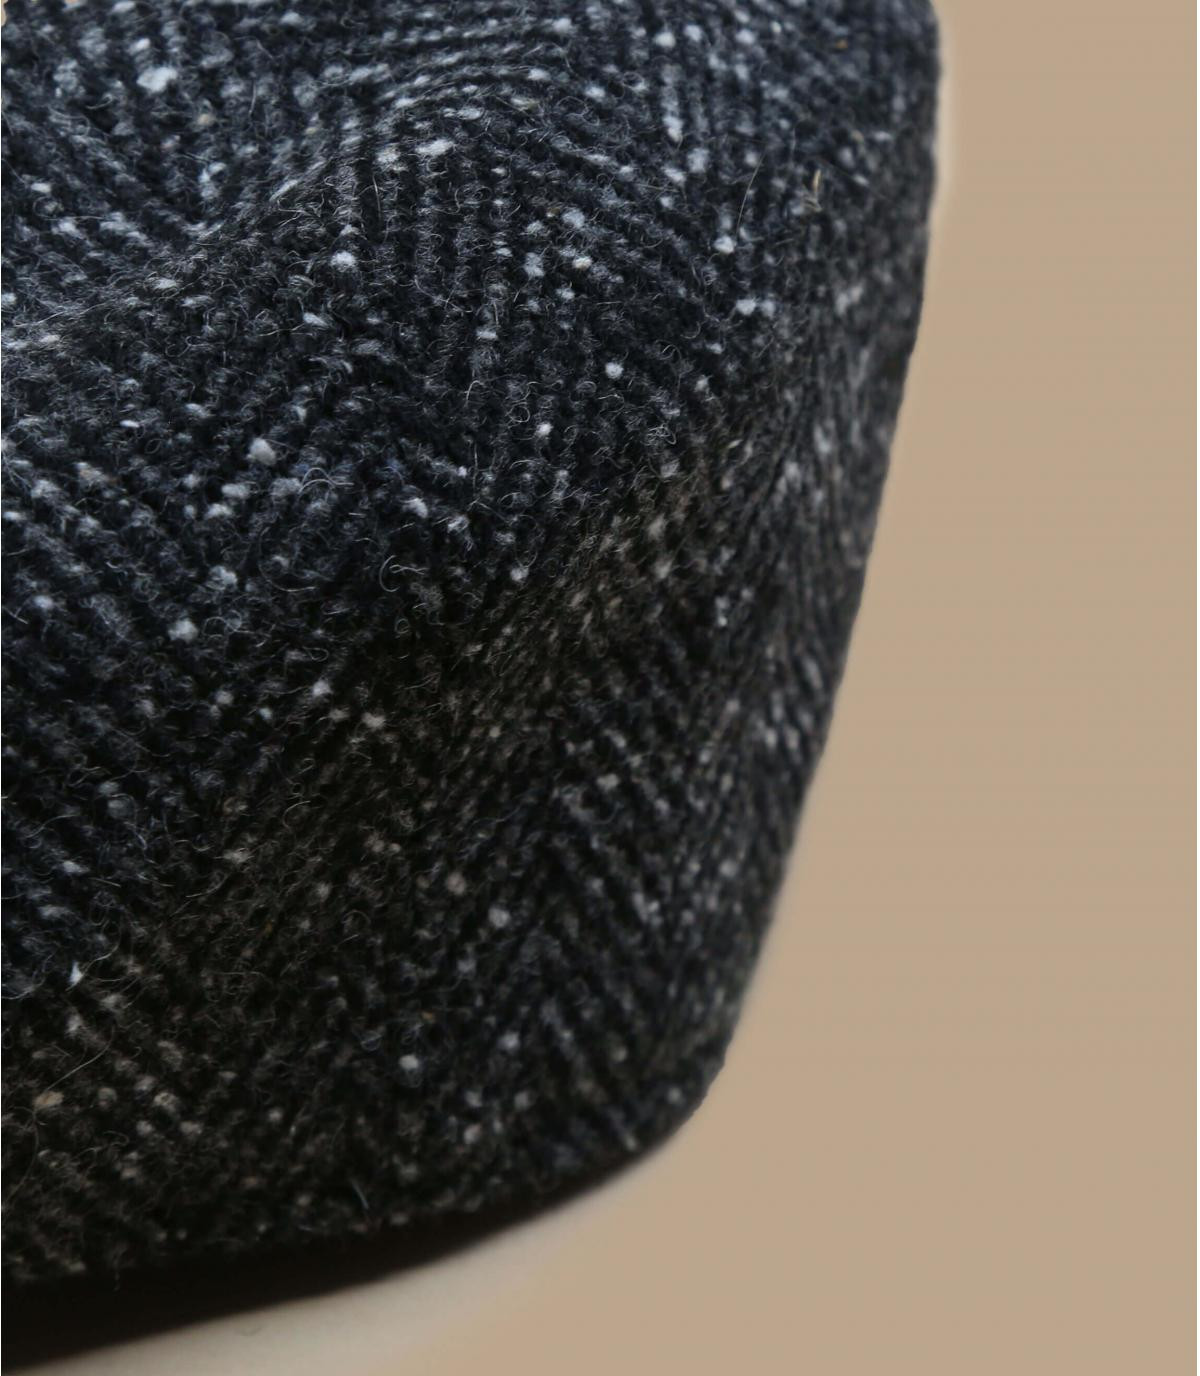 Detalles Staffy Atollo noir imagen 2